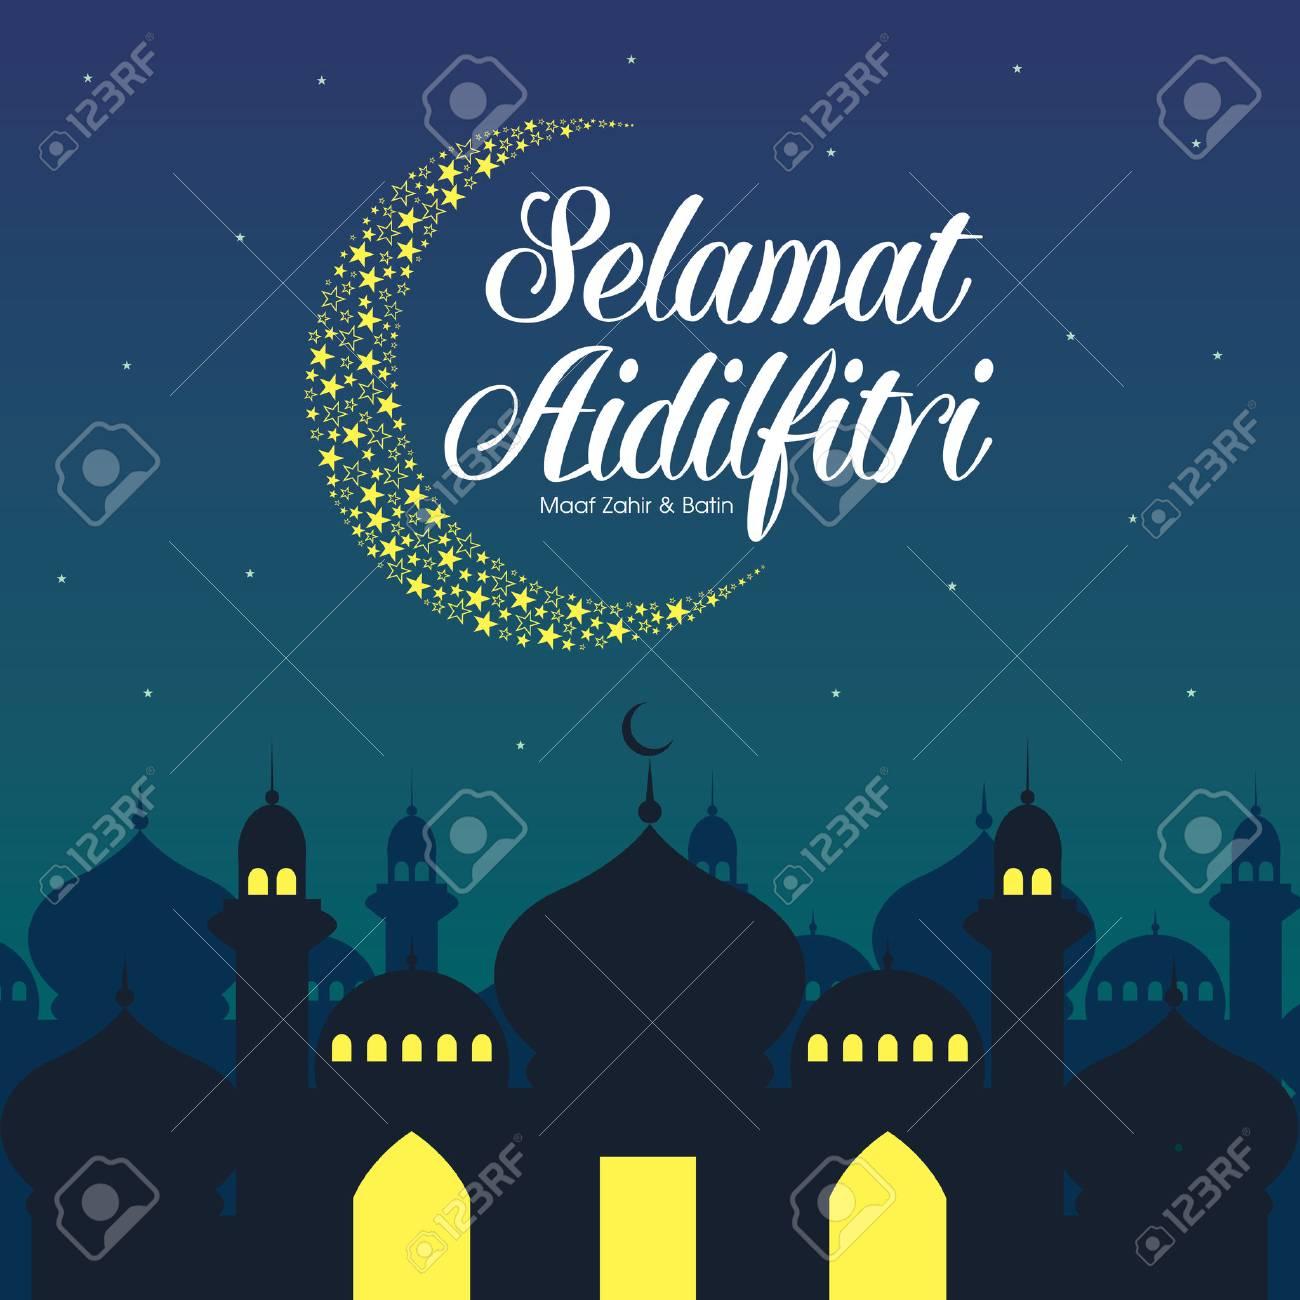 Selamat Hari Raya Aidilfitri vector illustration with traditional malay mosque. Caption: Fasting Day of Celebration - 79013969